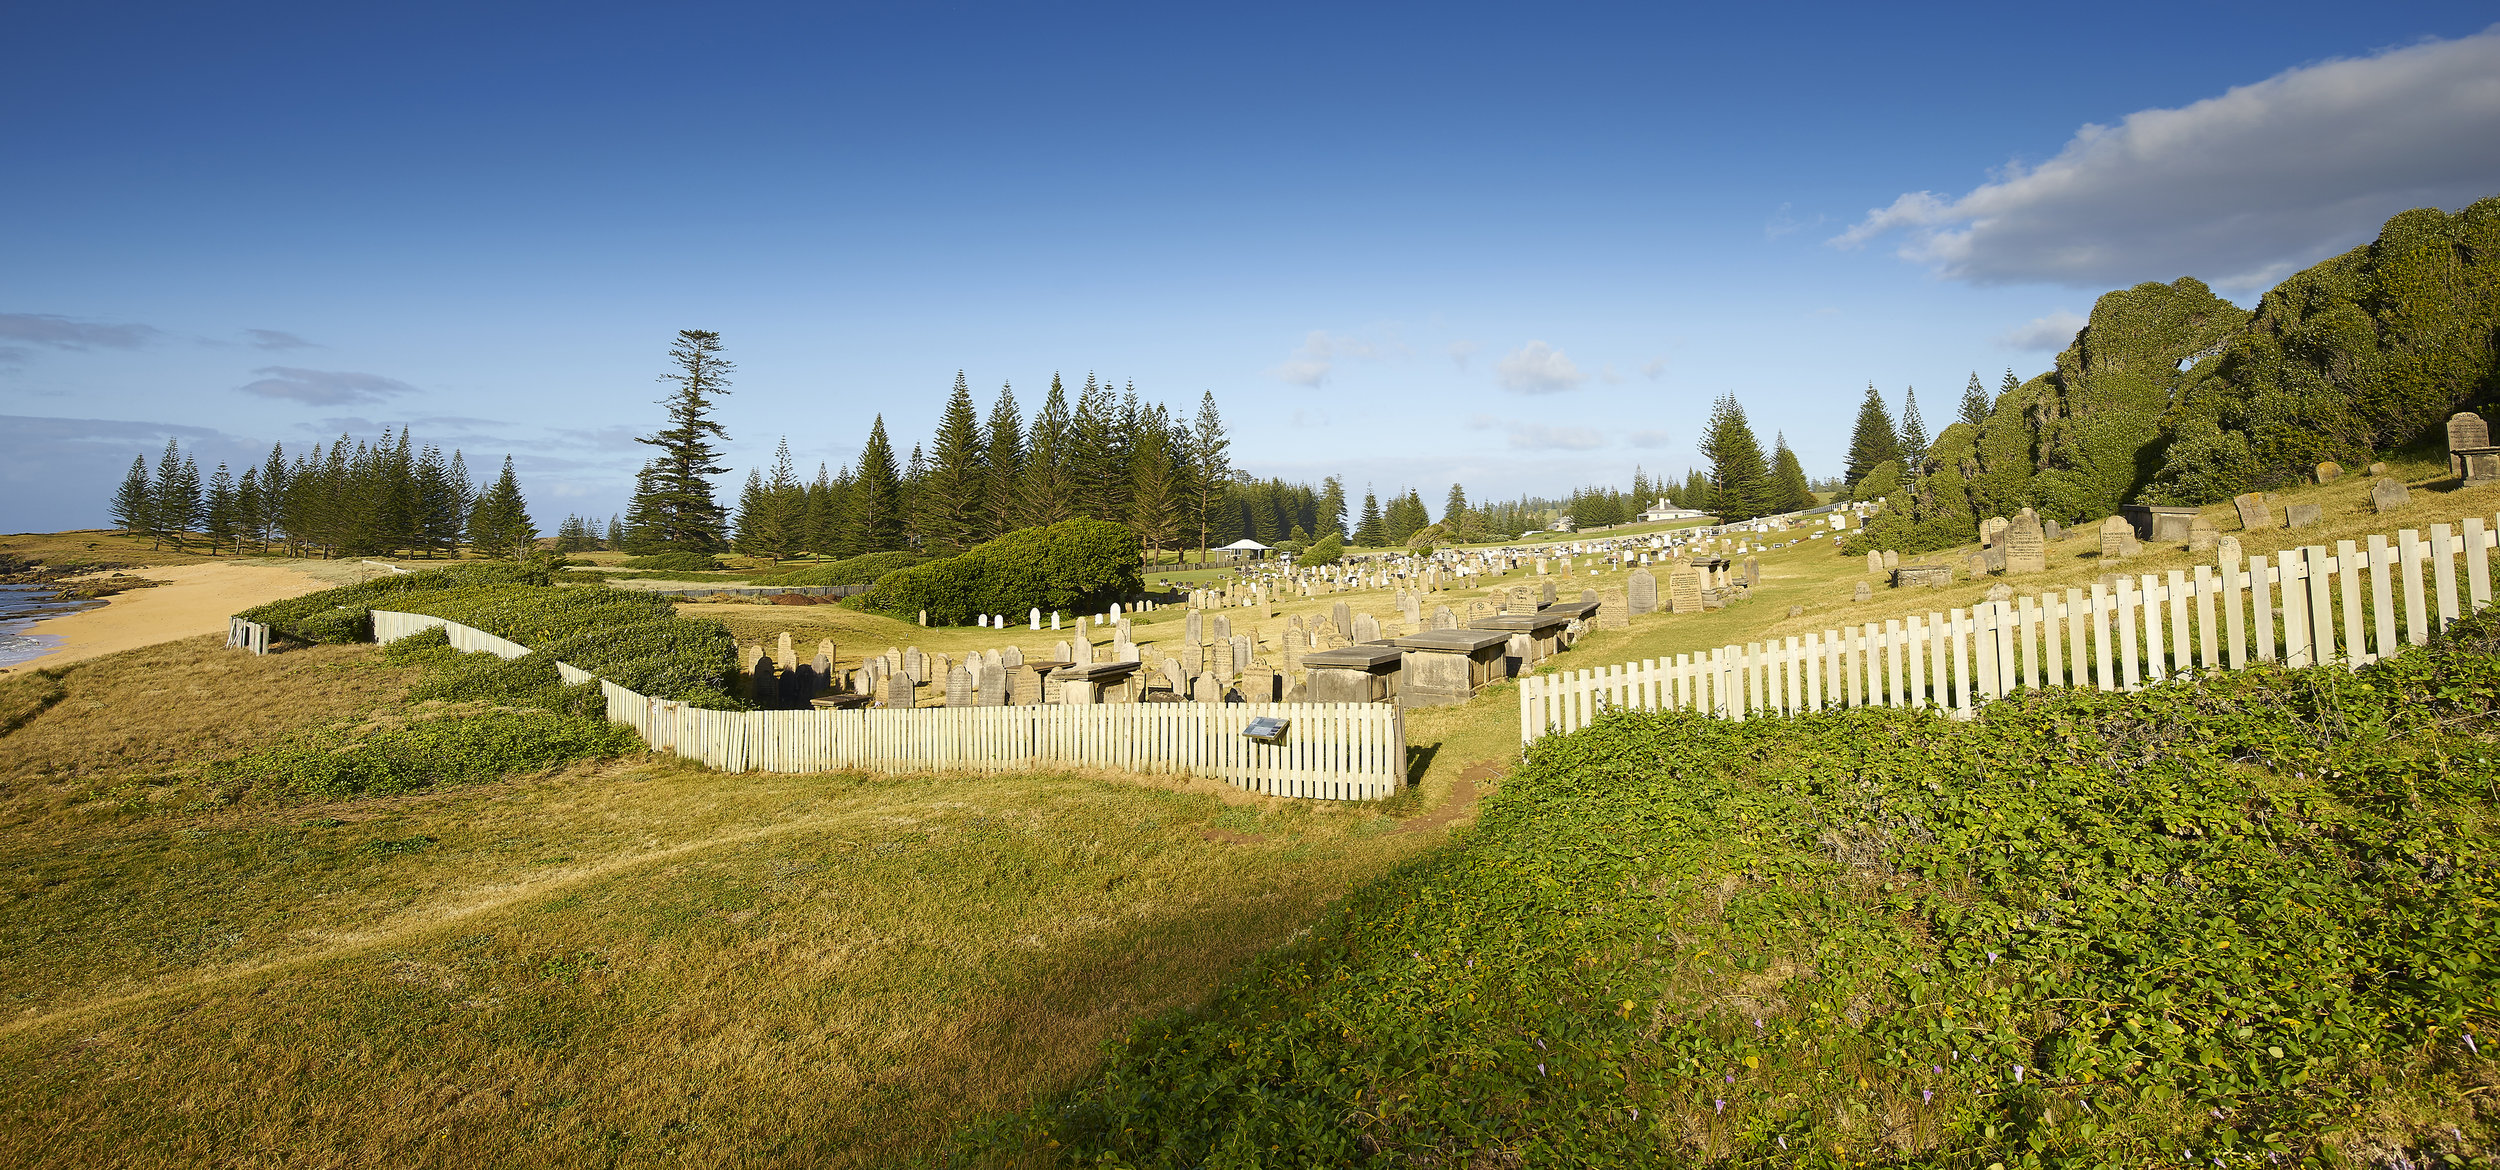 E. Cemetery.jpg